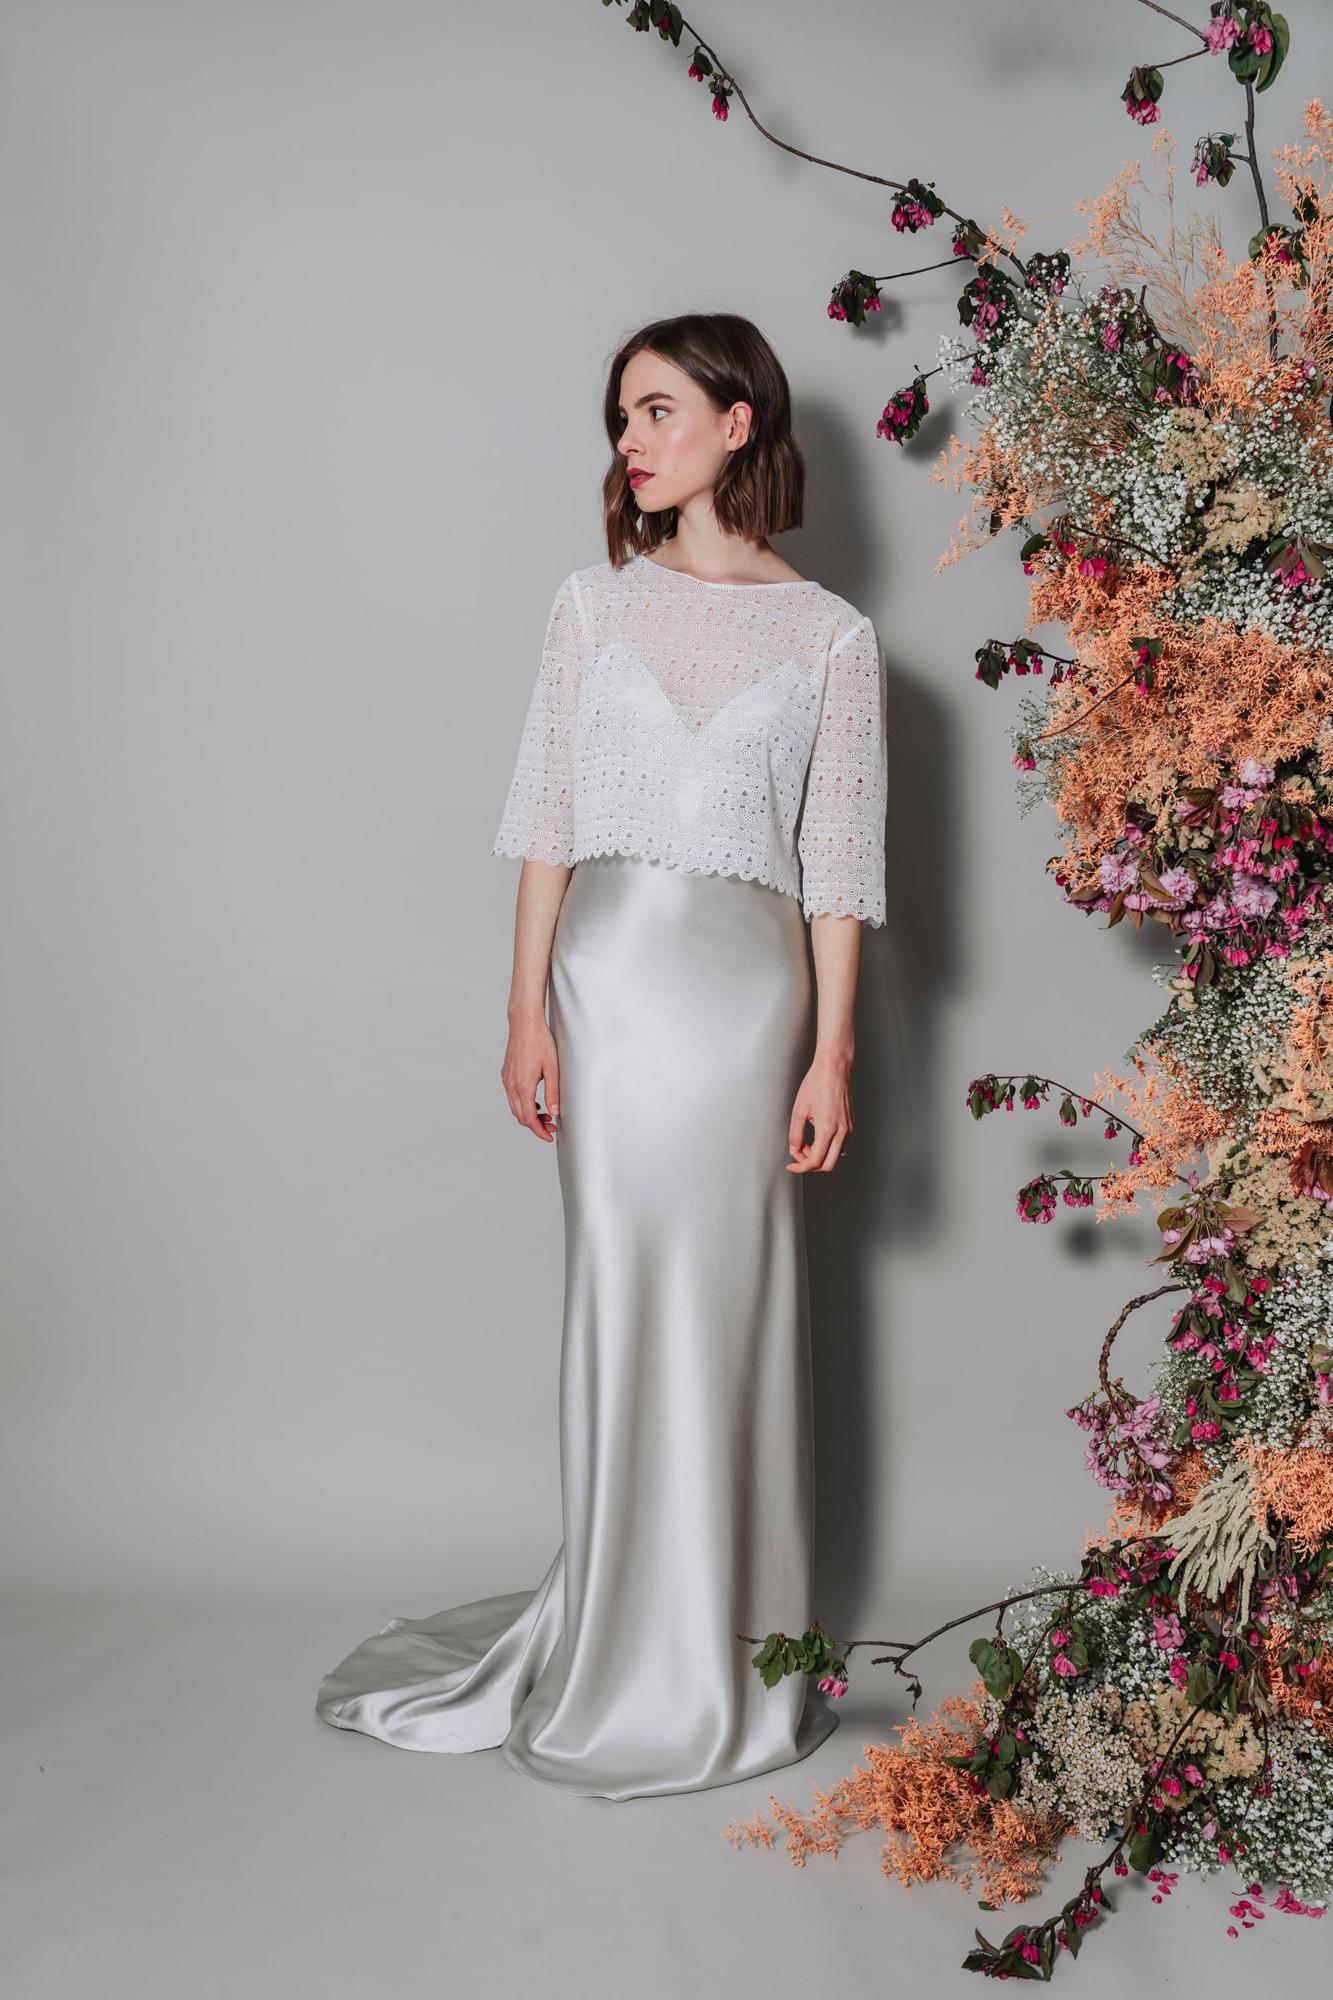 Kate-Beaumont-Sheffield-Cosmos-Minimal-Modern-Silver-Silk-Slip-Wedding-Dress-9.jpg